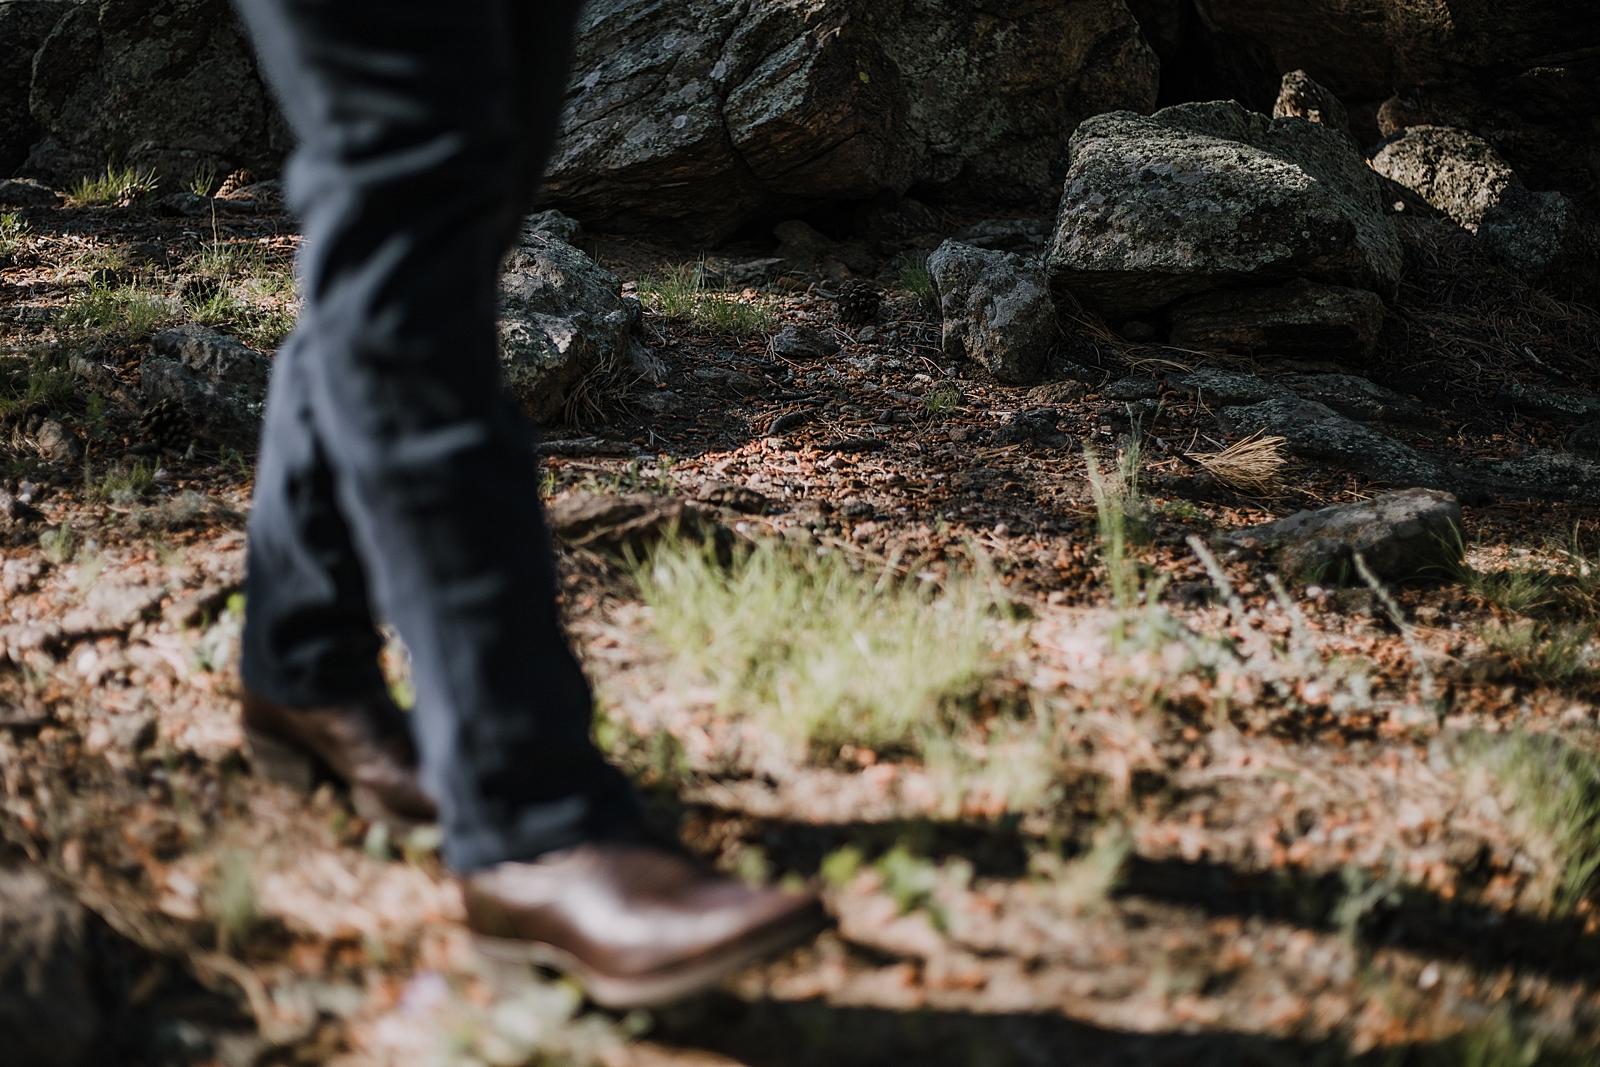 grooms boots, RMNP elopement ceremony, rocky mountain national park elopement, 3M curves elopement, self solemnizing, self solemnization, long's peak, summer hiking elopement, estes park elopement